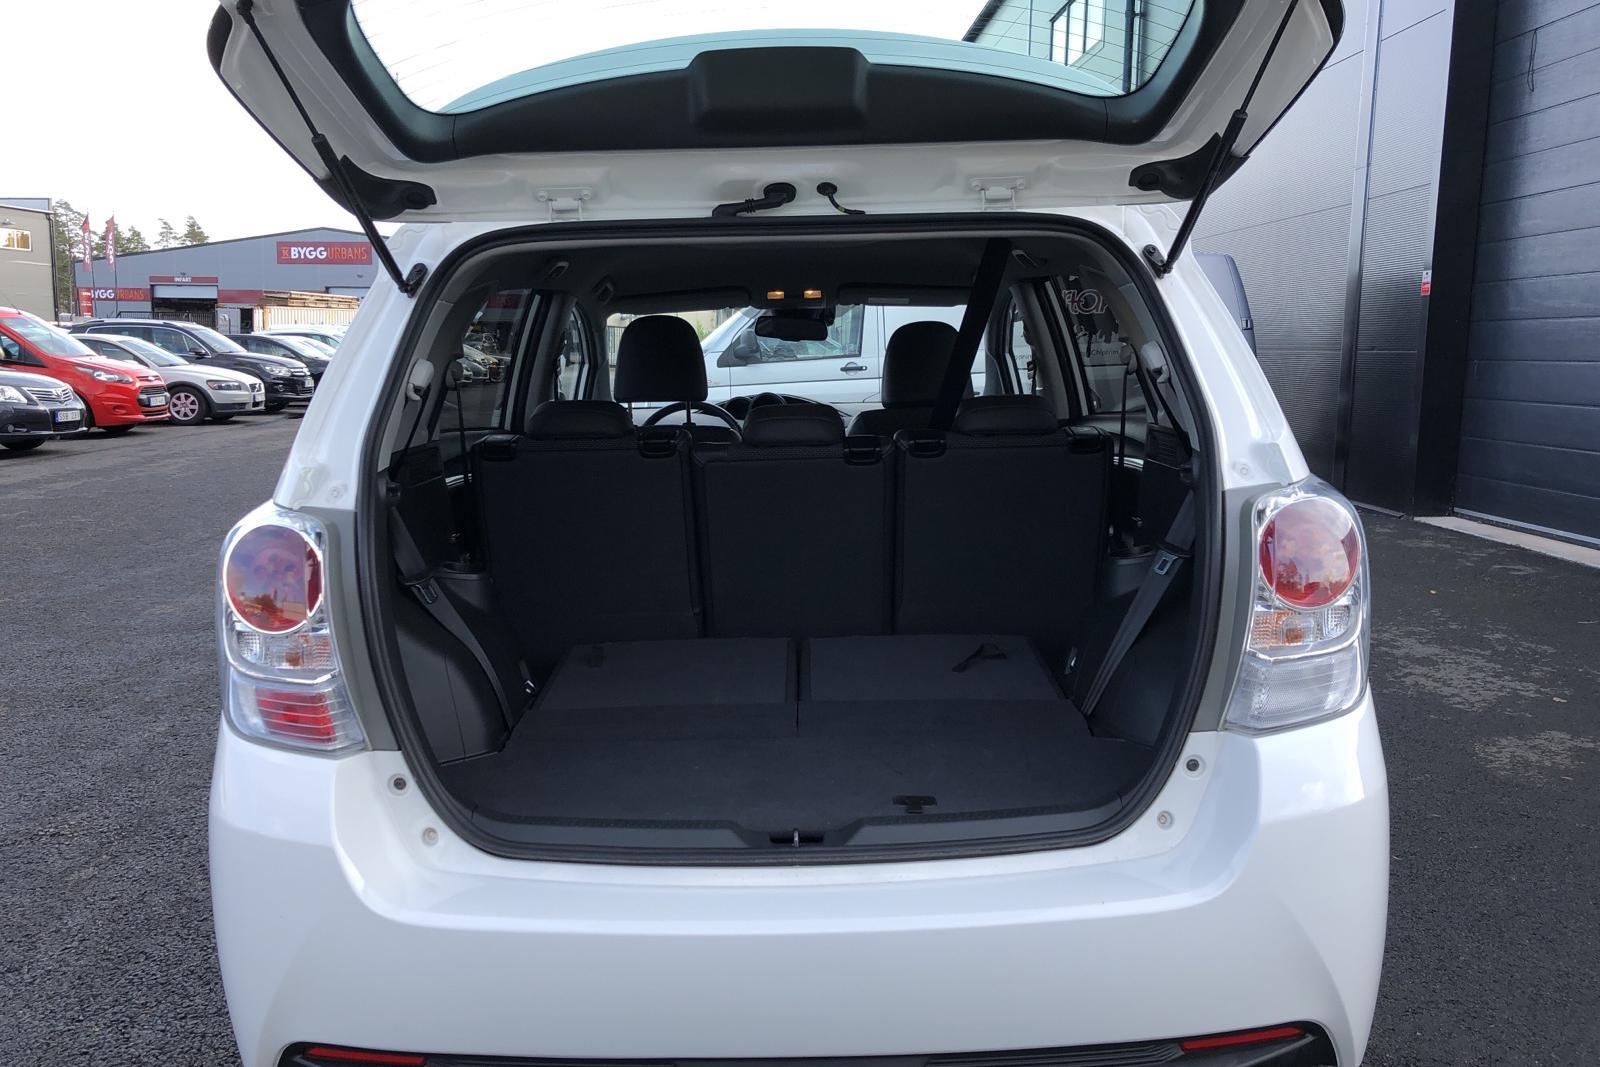 Toyota Verso VVT-i 1.8 (147hk) 7 sits - 20 000 km - Manual - white - 2017